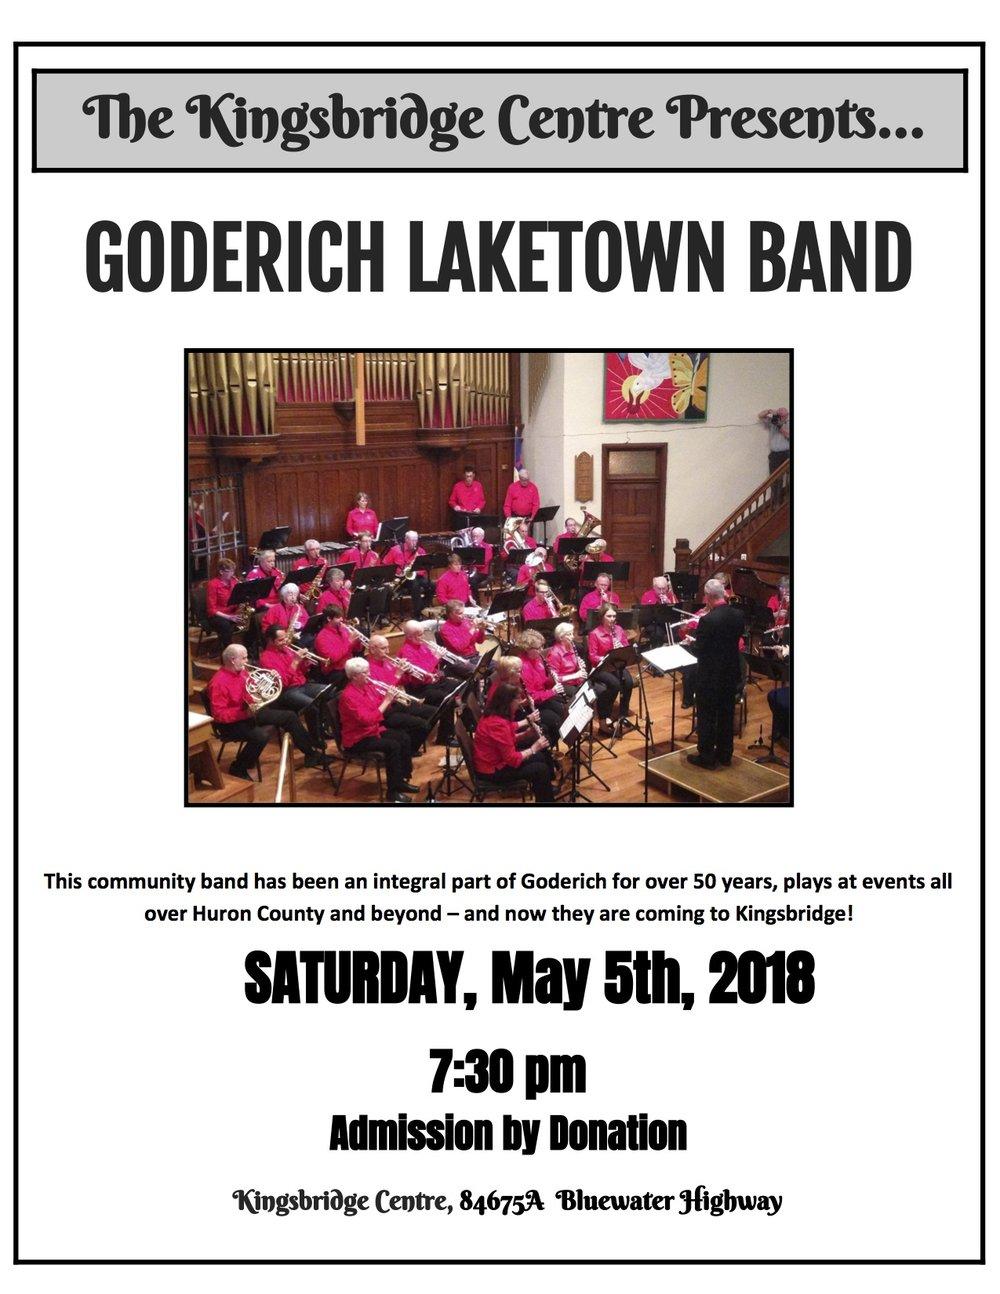 Goderich Laketown Band Poster.jpg